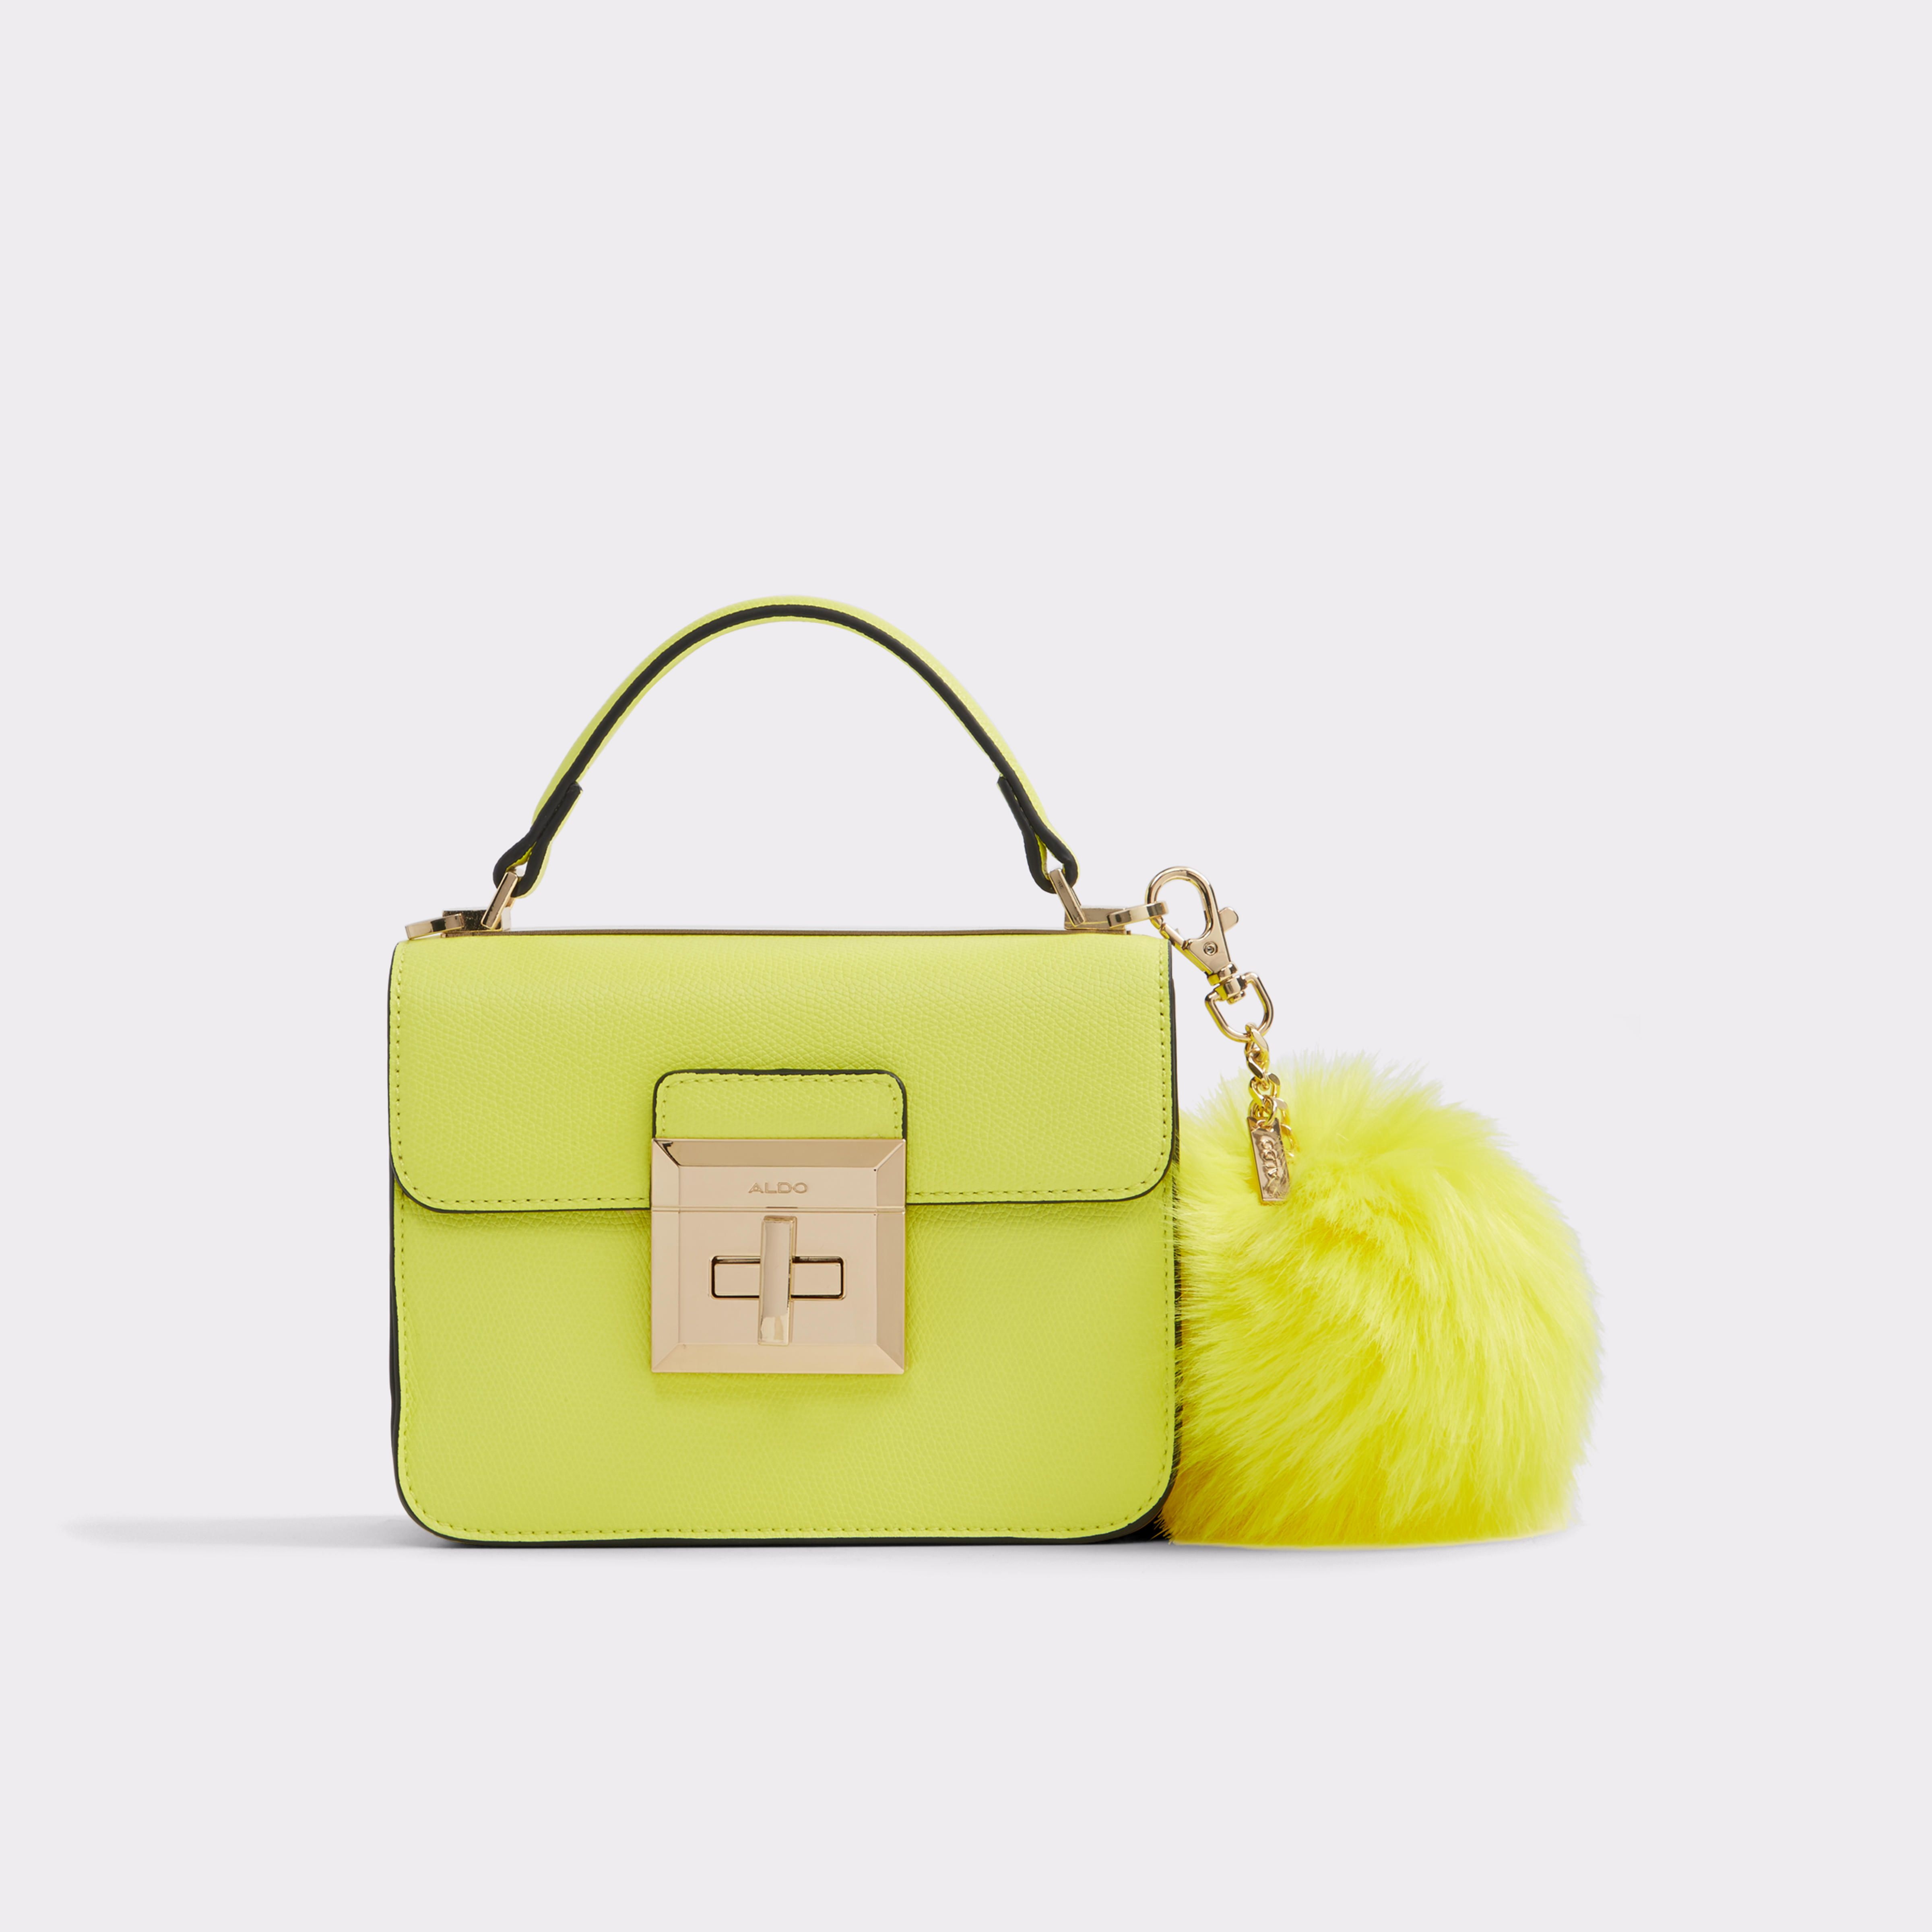 568a7bde057 Chiadda Yellow Misc. Women s Top handle